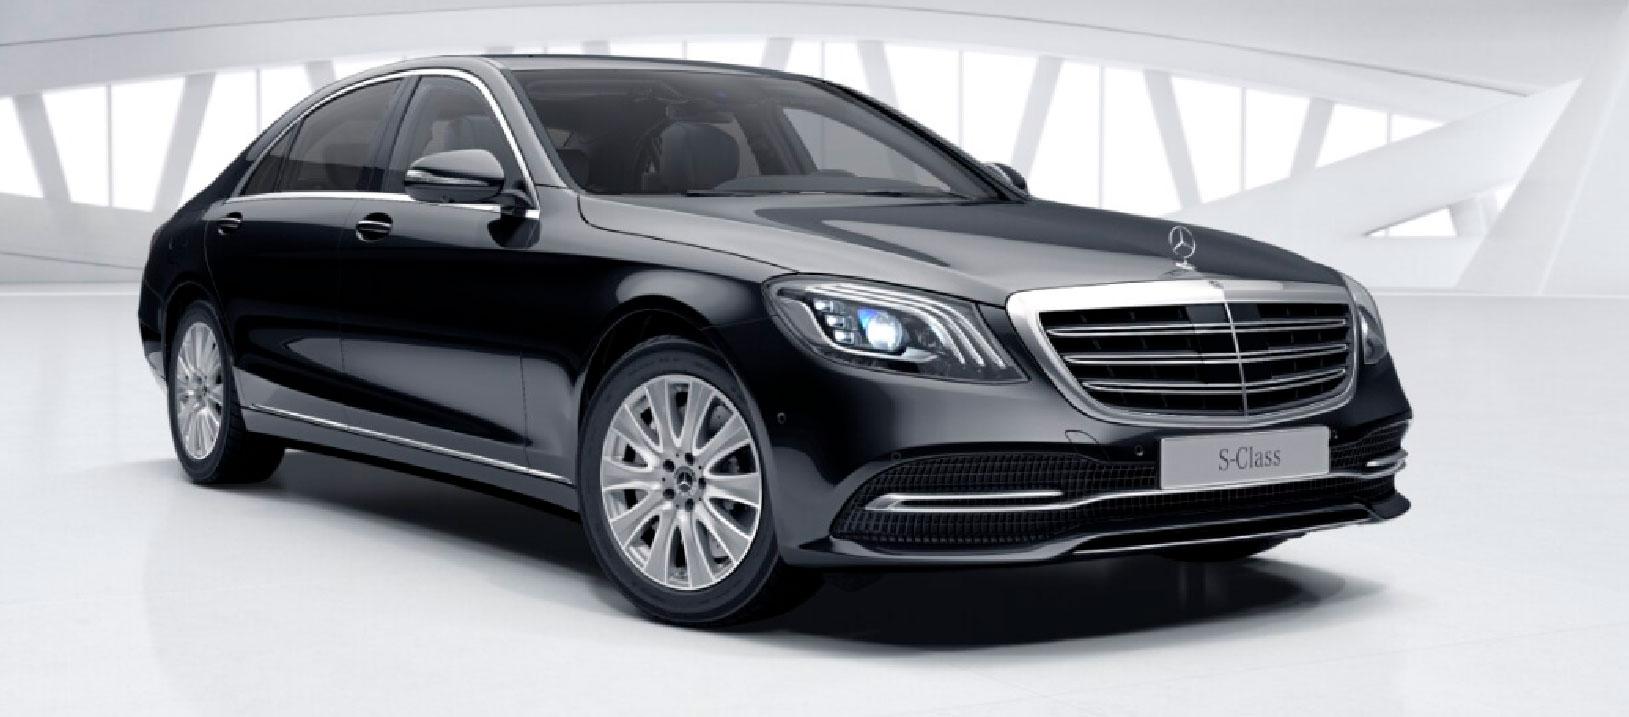 Mercedes-Benz S-Class Limousine 0052601008